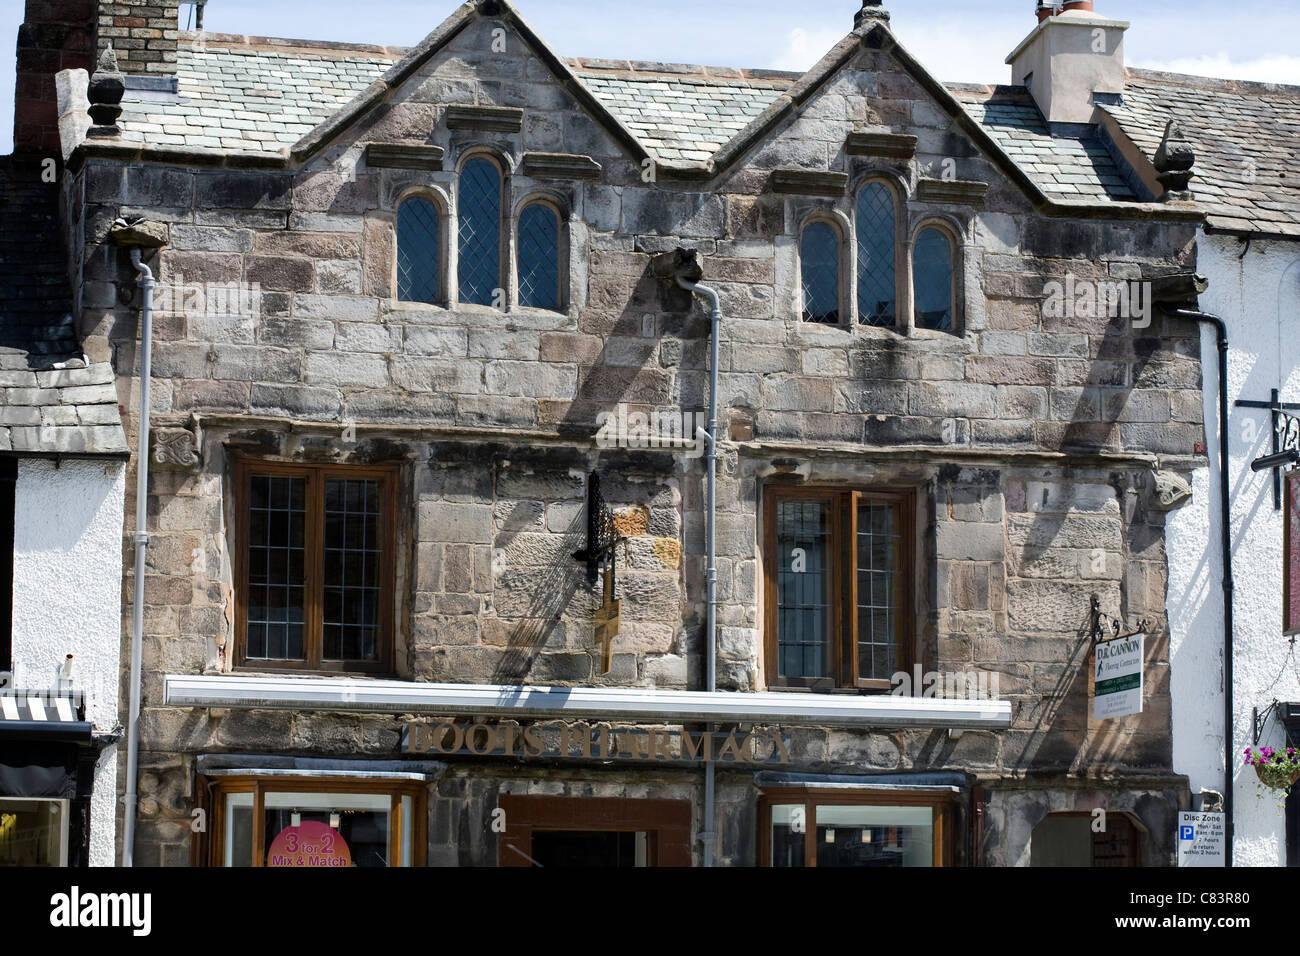 Ancient Facade Boroughgate Appleby-in-Westmorland Cumbria England - Stock Image